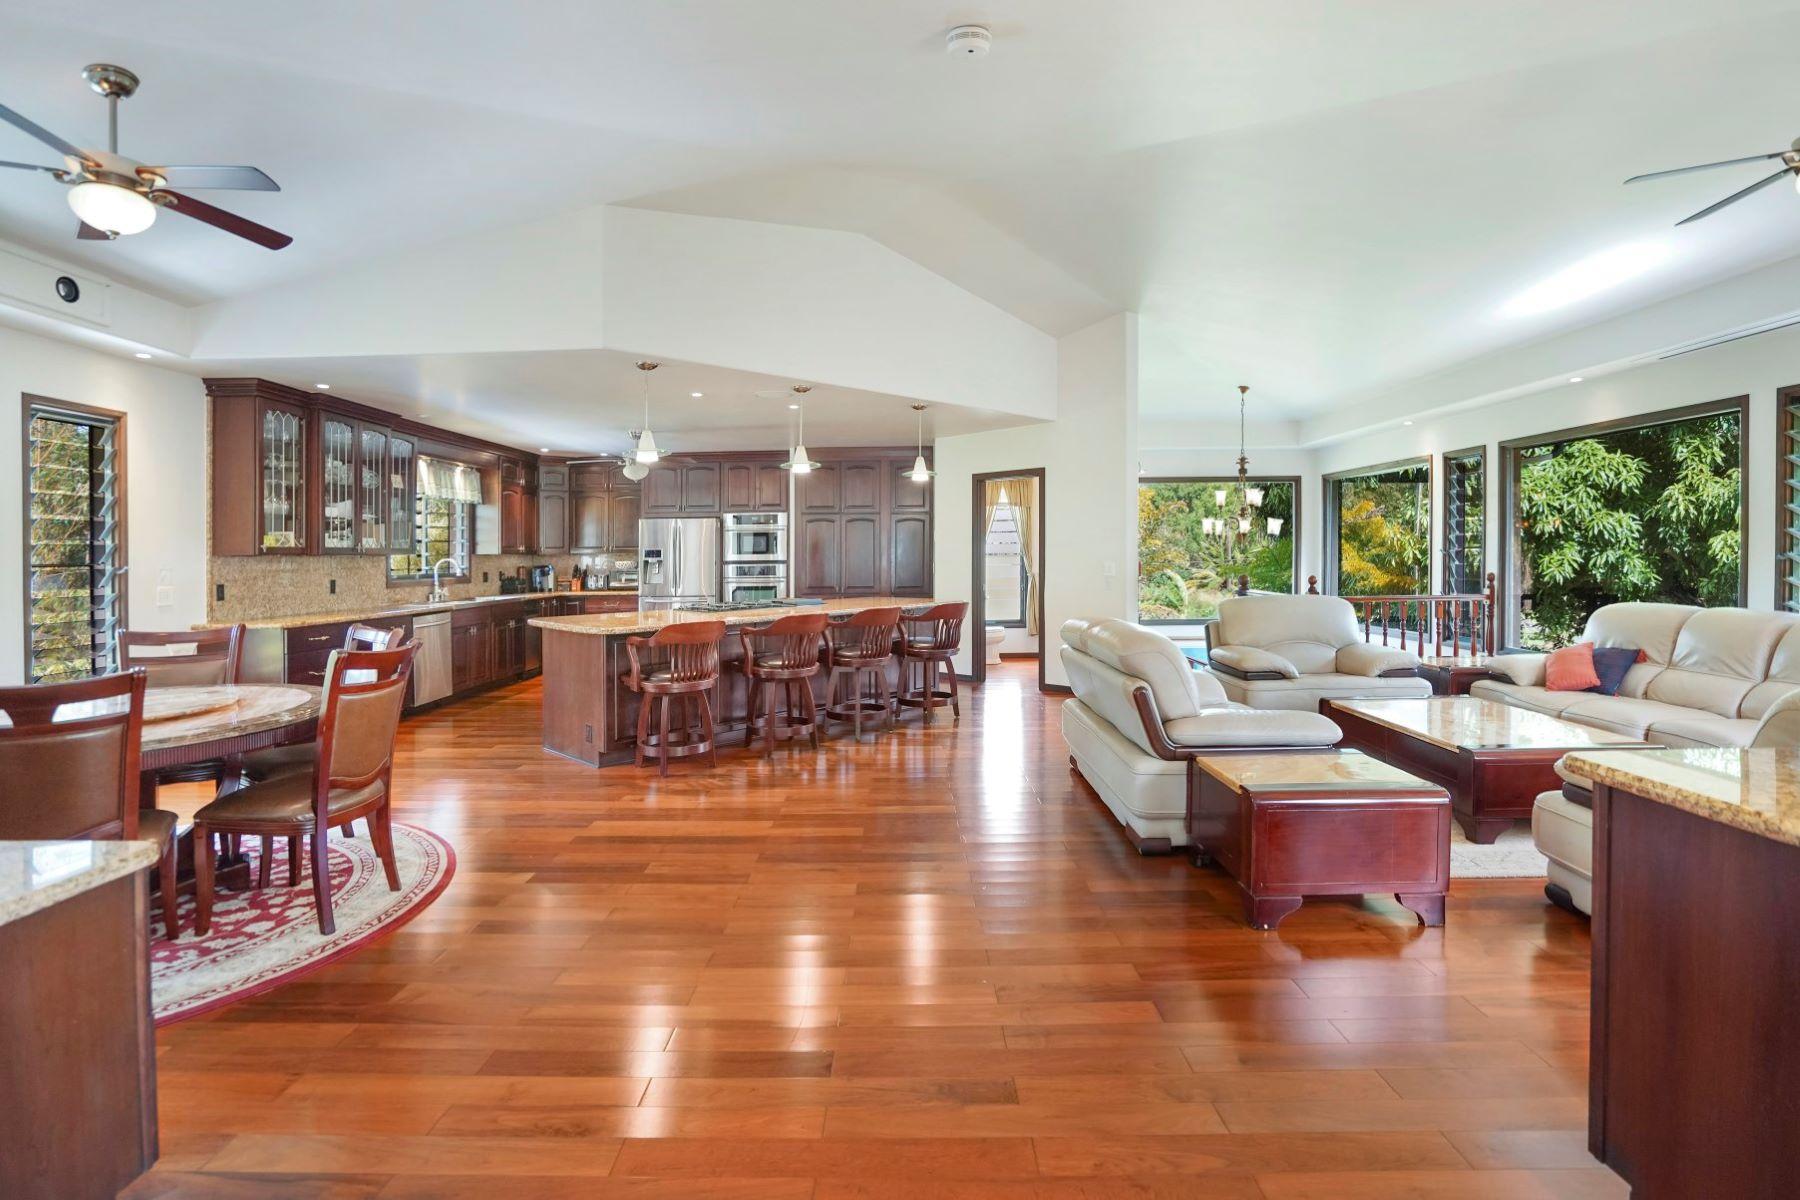 Single Family Homes for Sale at 2347 NIUMALU RD LIHUE, HI 96766 2347 NIUMALU RD Lihue, Hawaii 96766 United States